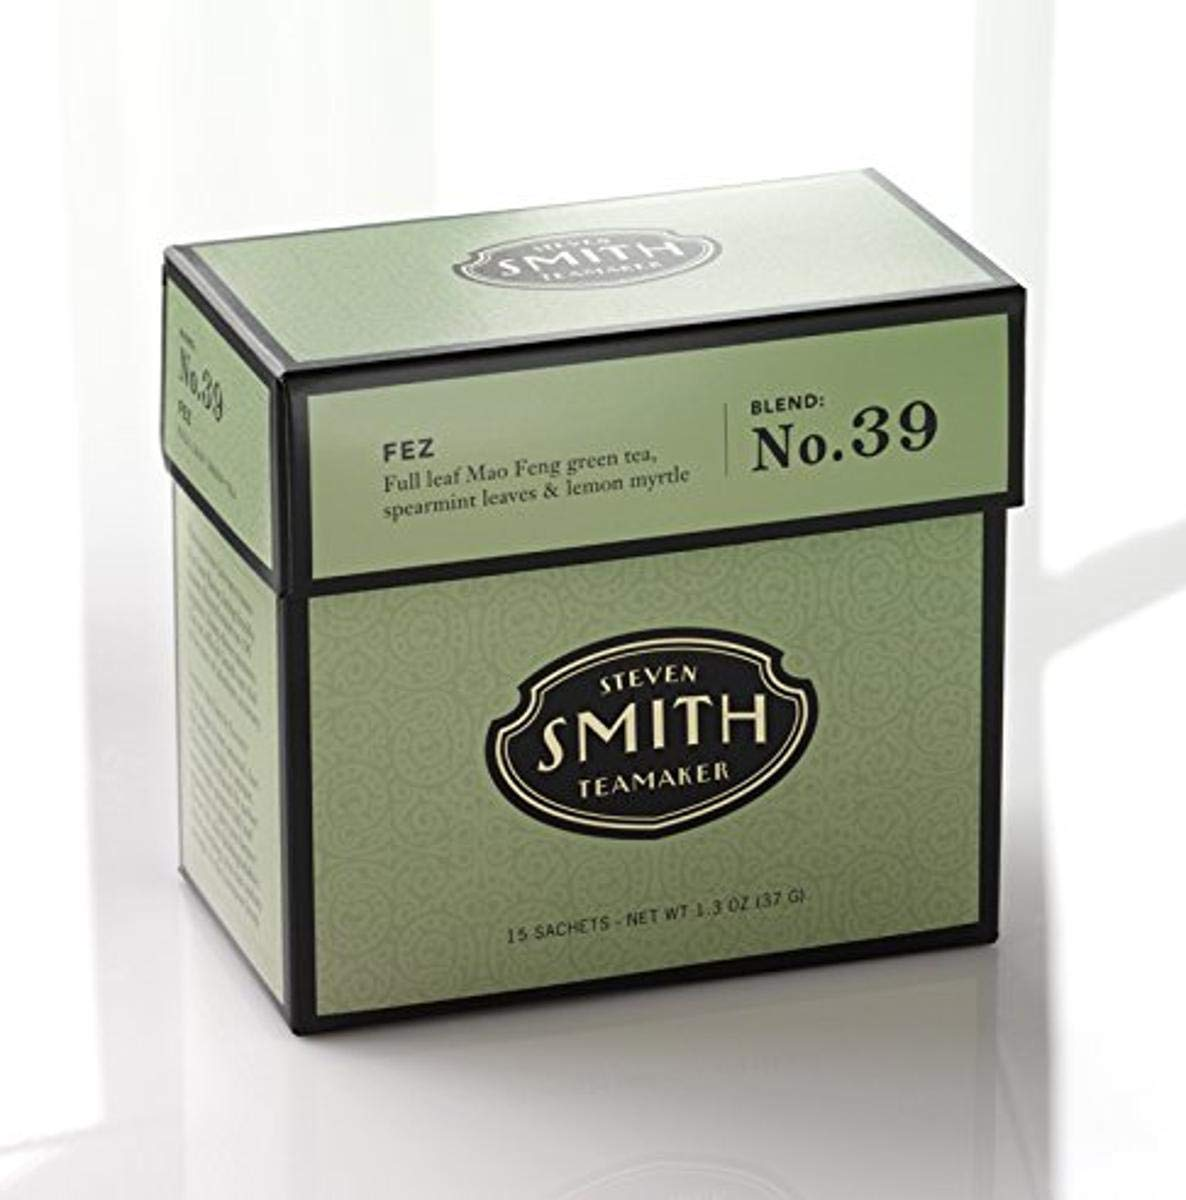 Smith Teamaker Fez Blend No. 39 (Full Leaf Green Tea), 1.3 oz, 15 Bags